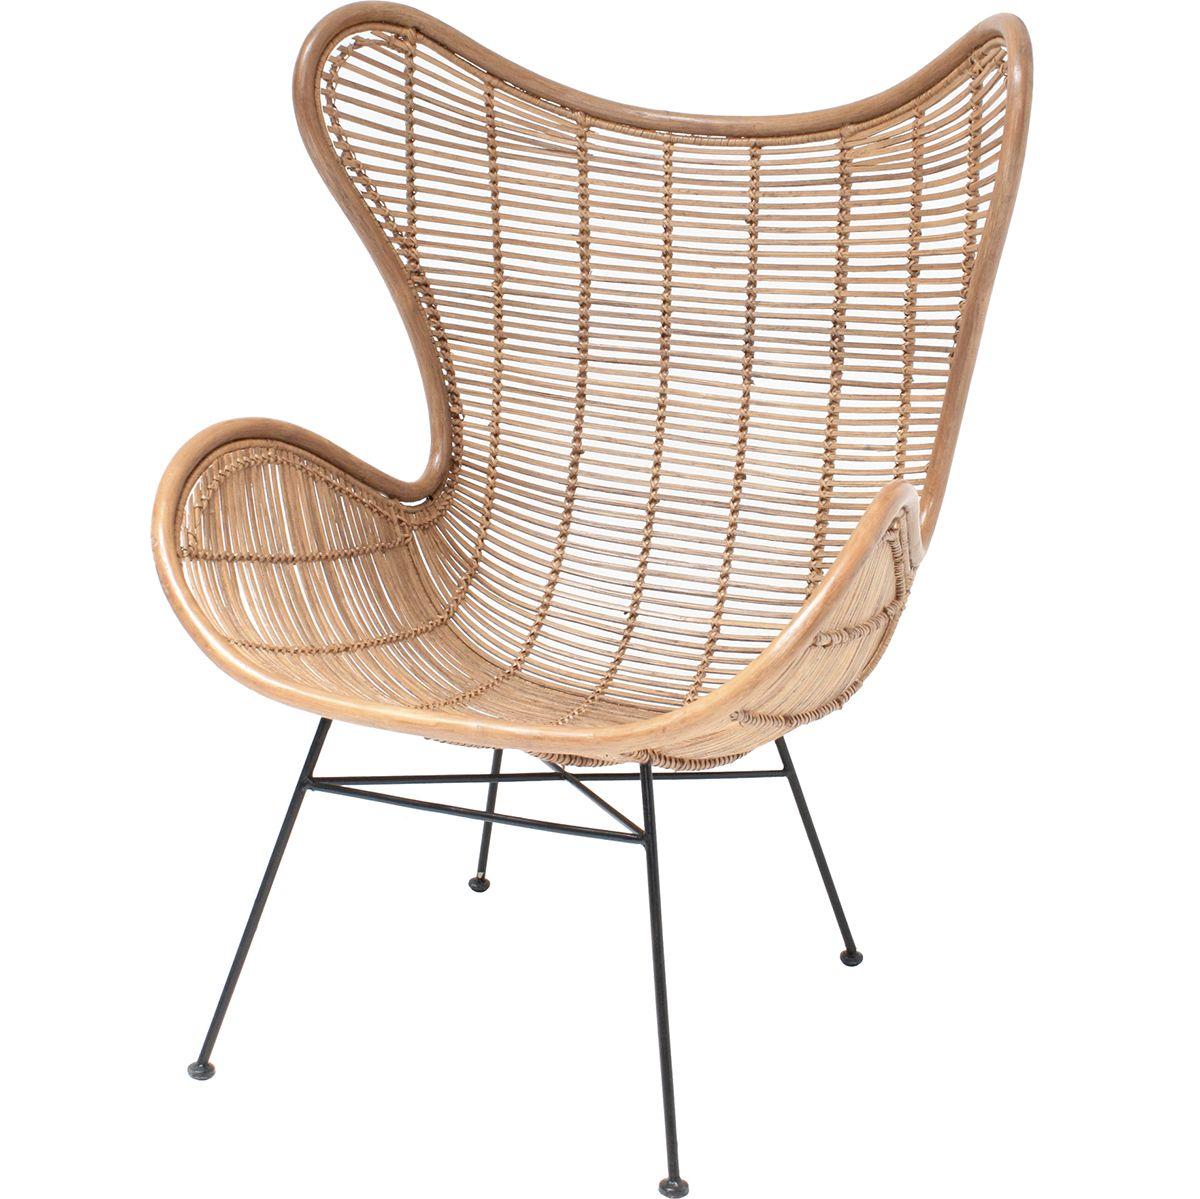 HK Living Egg Rattan Lounge Chair | Lounge Chair | Pinterest